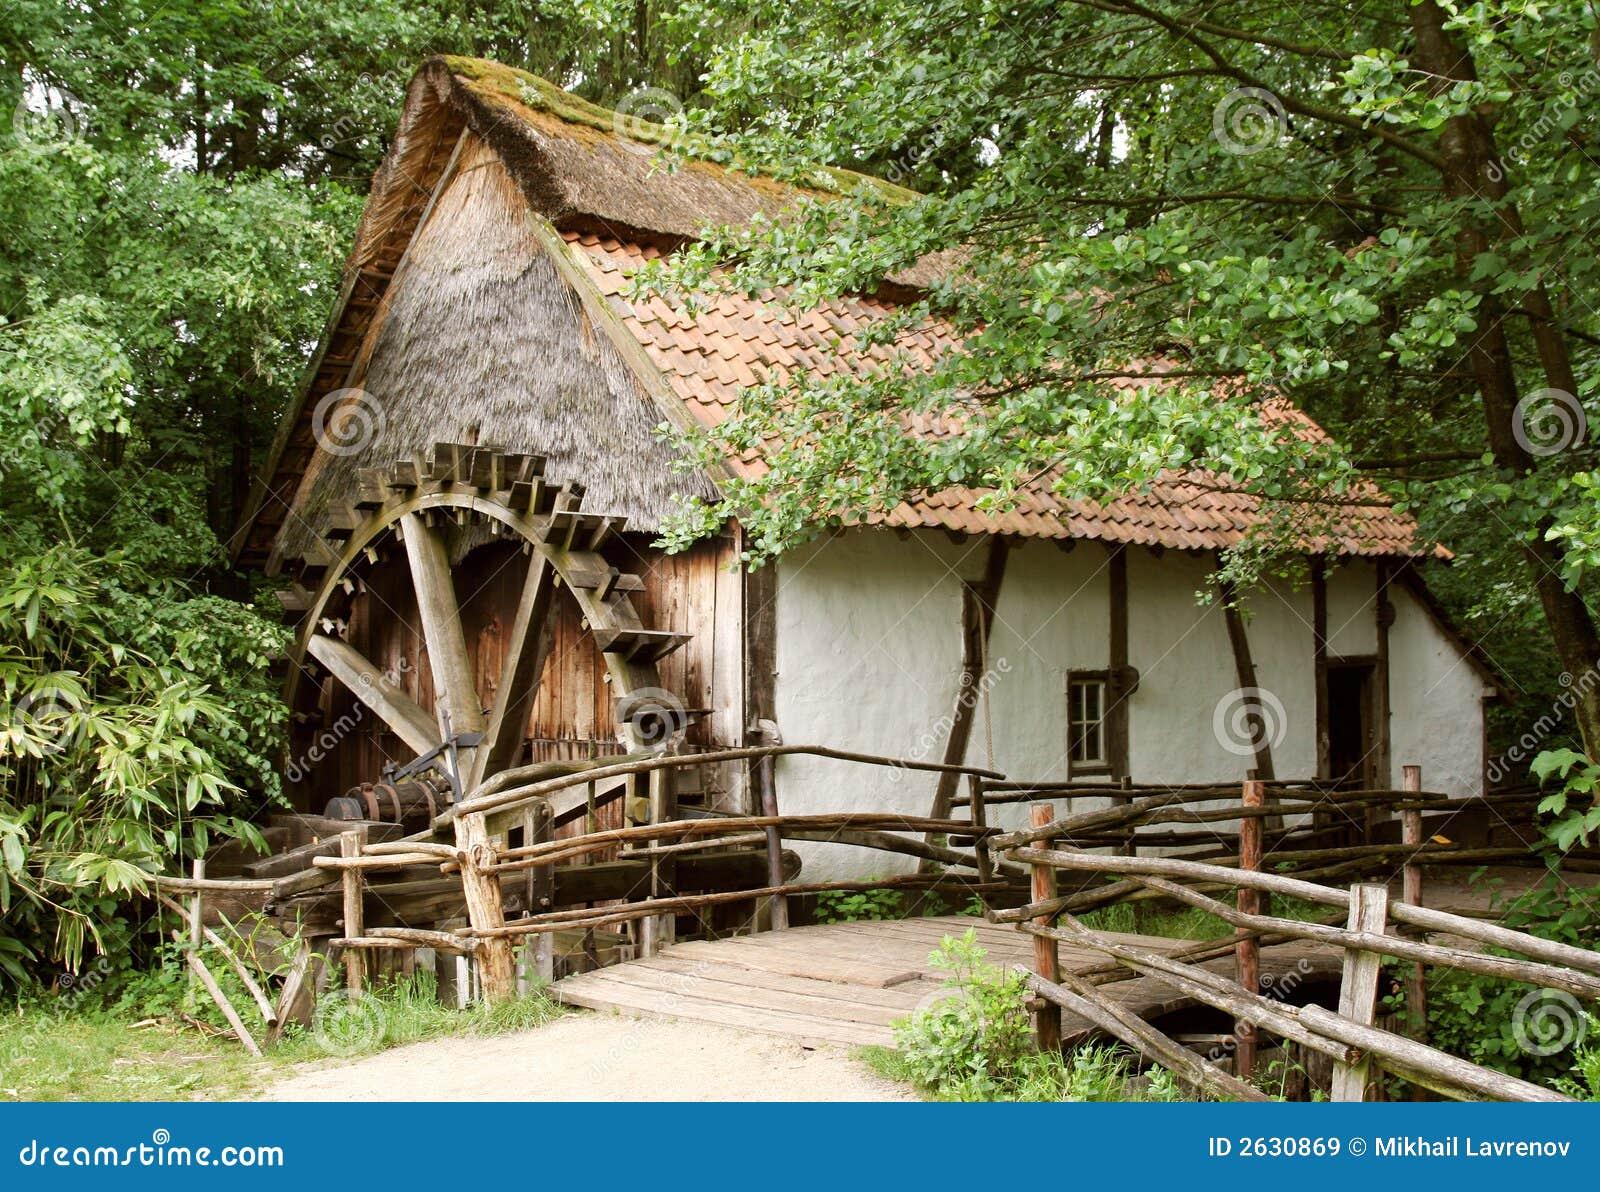 Watermill de Vieux-mode